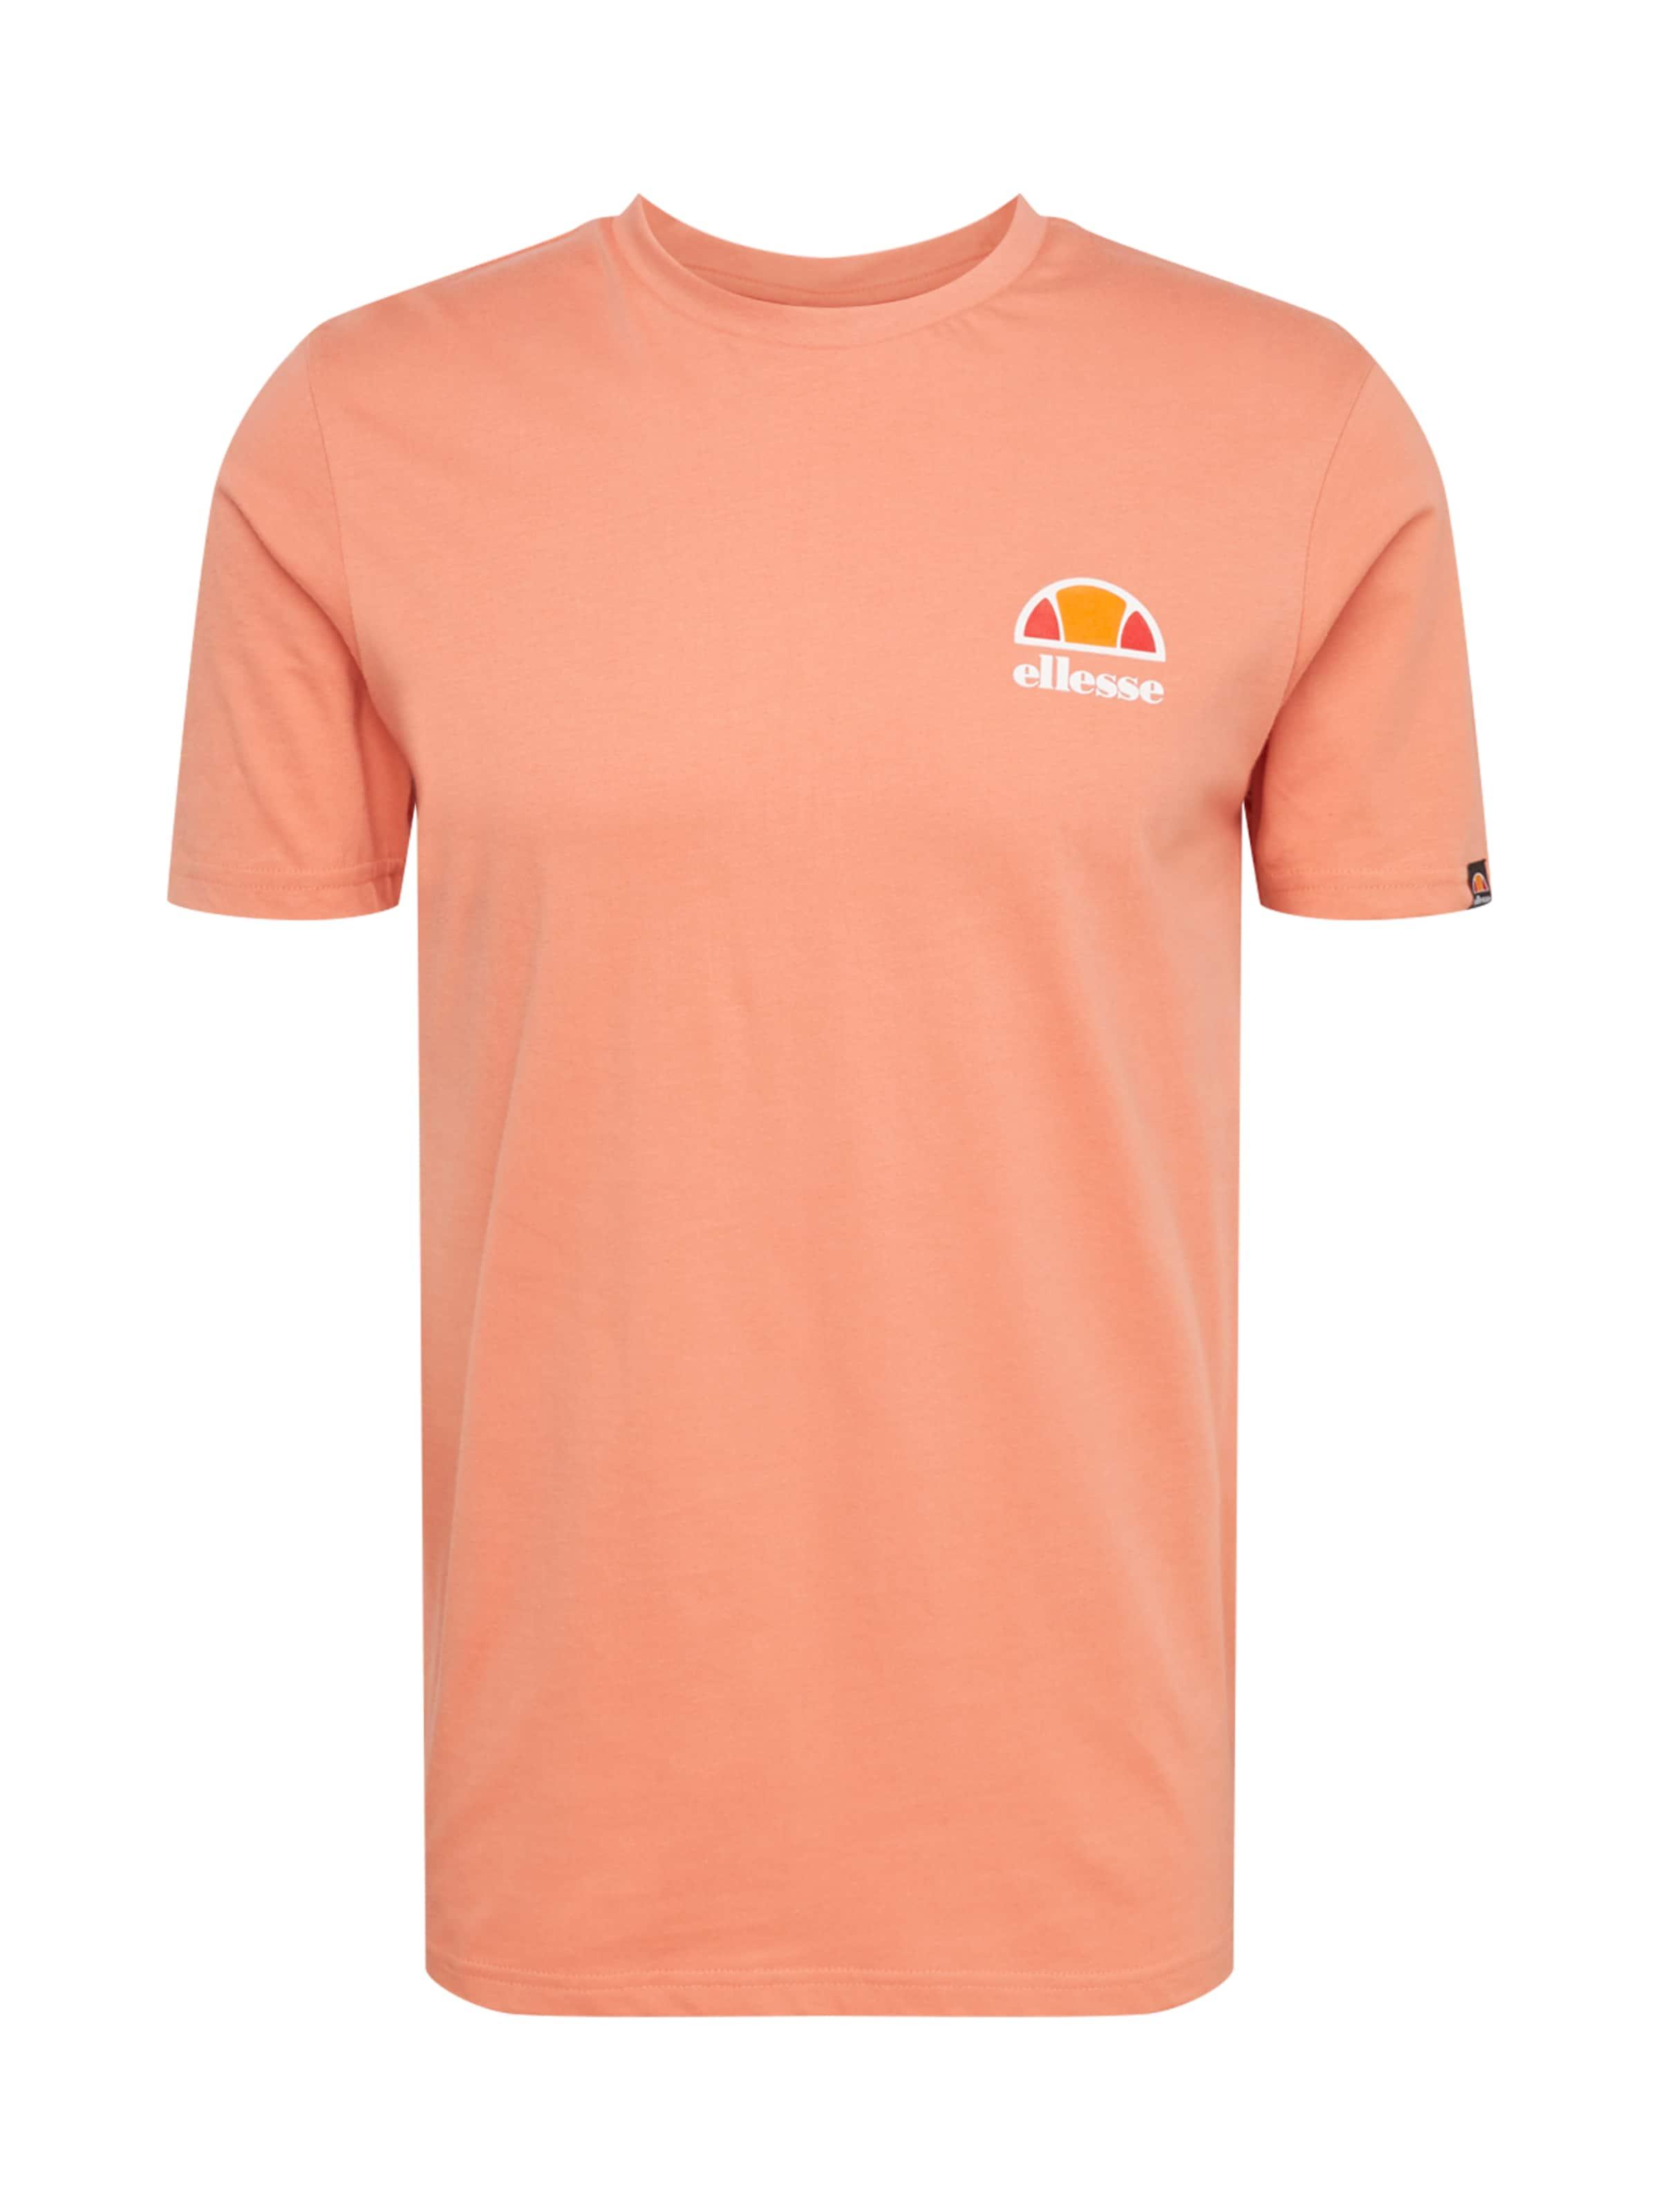 En Rose T shirt Ancienne Ellesse 'canaletto' fqwvnz7YU